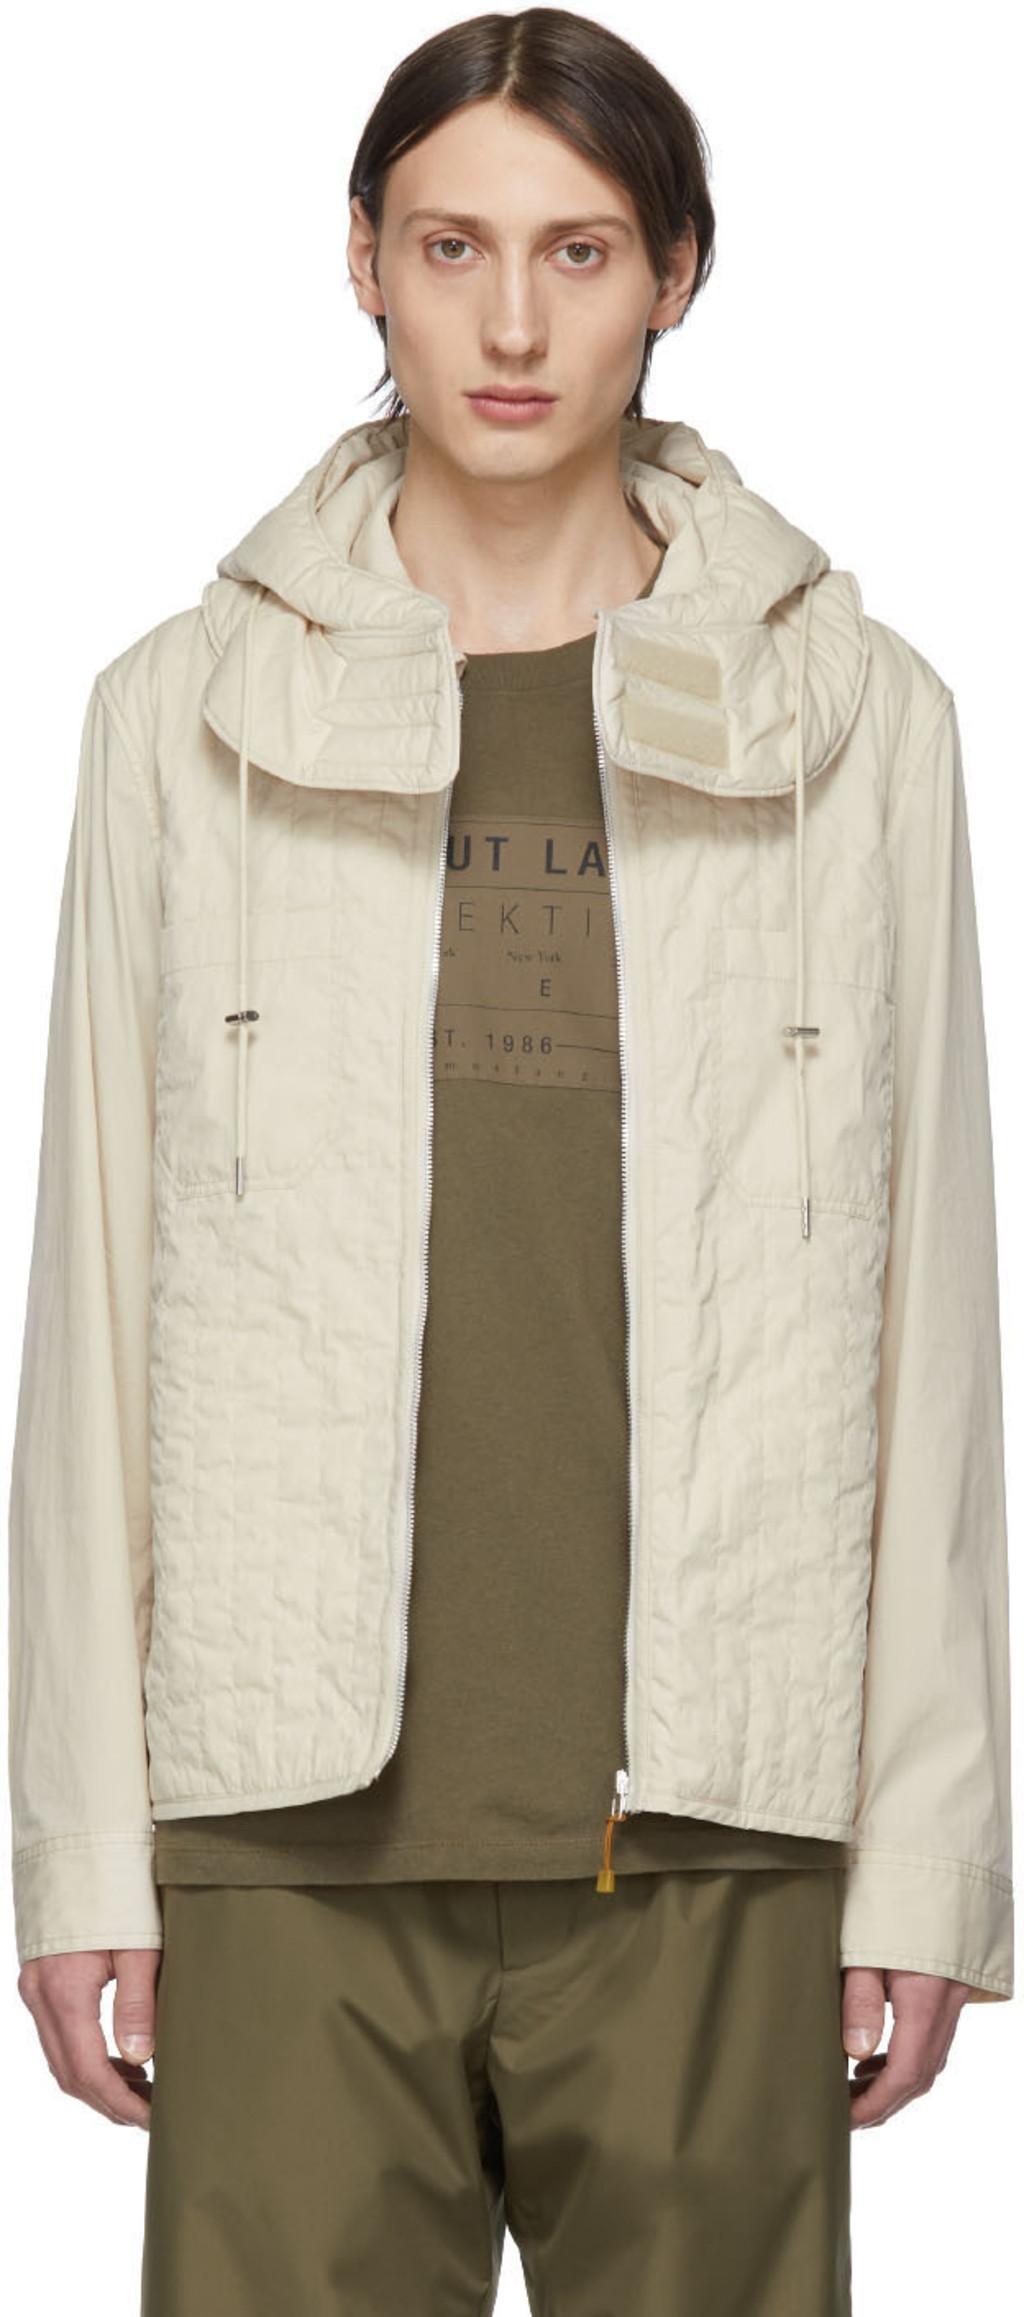 Quilted Off Zip White Jacket zMUVpLqGS